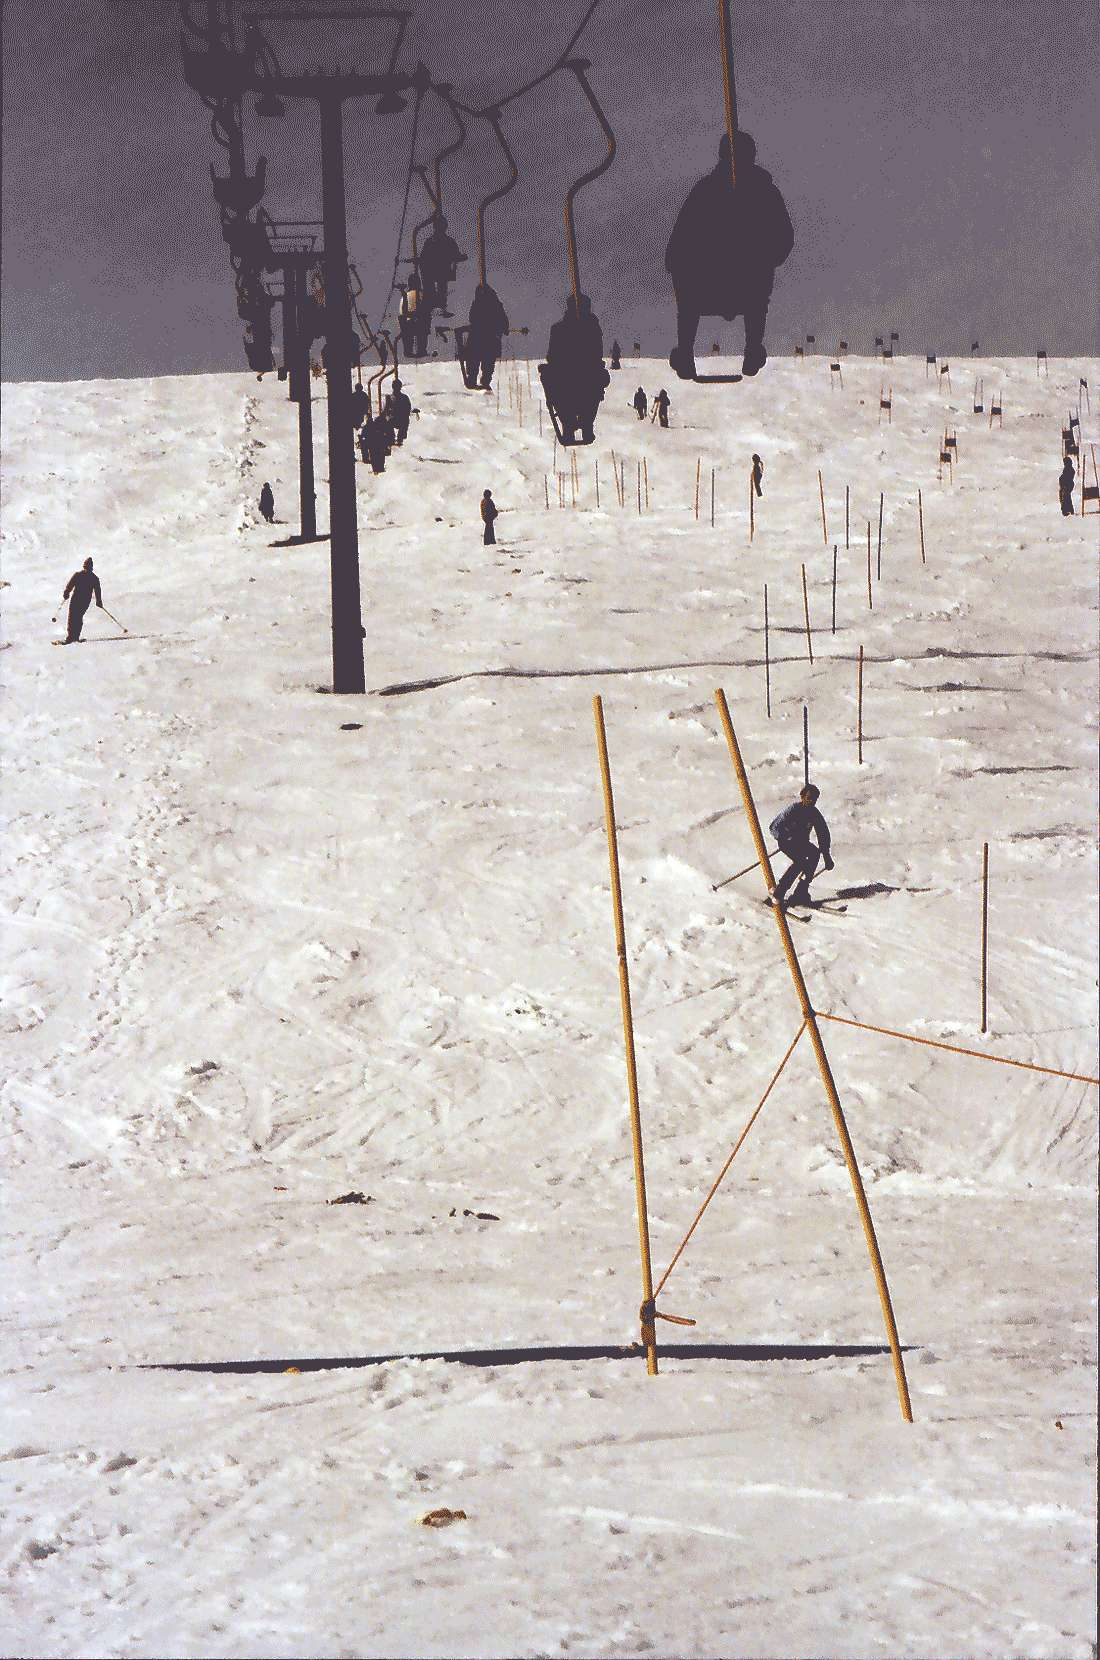 Feldberg: Skilift Feldberg; kleiner Lift; darunter Abfahrtsläufer, Bild 1